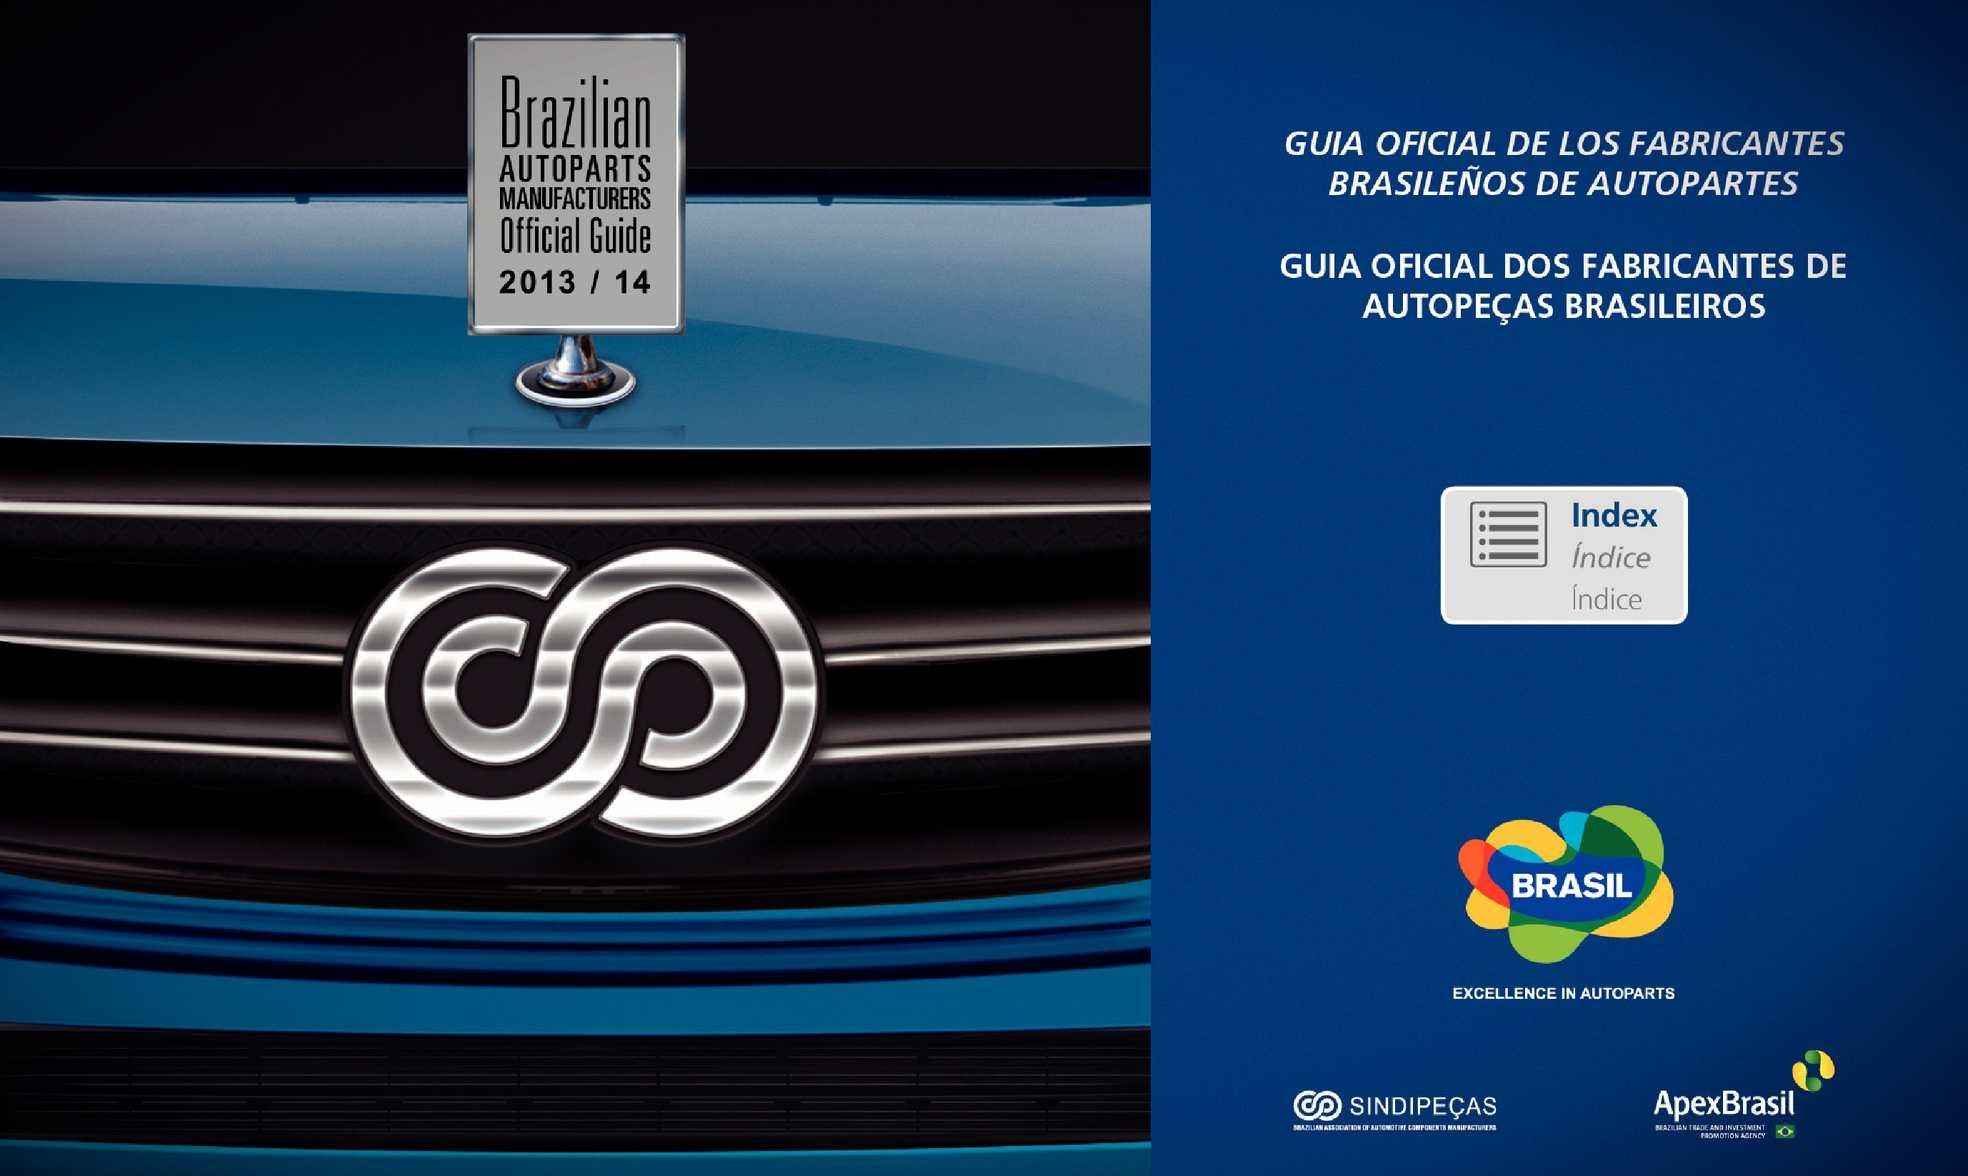 Calaméo - Brazilian Autoparts Manufacturers Official Guide 2013 2fc9941502